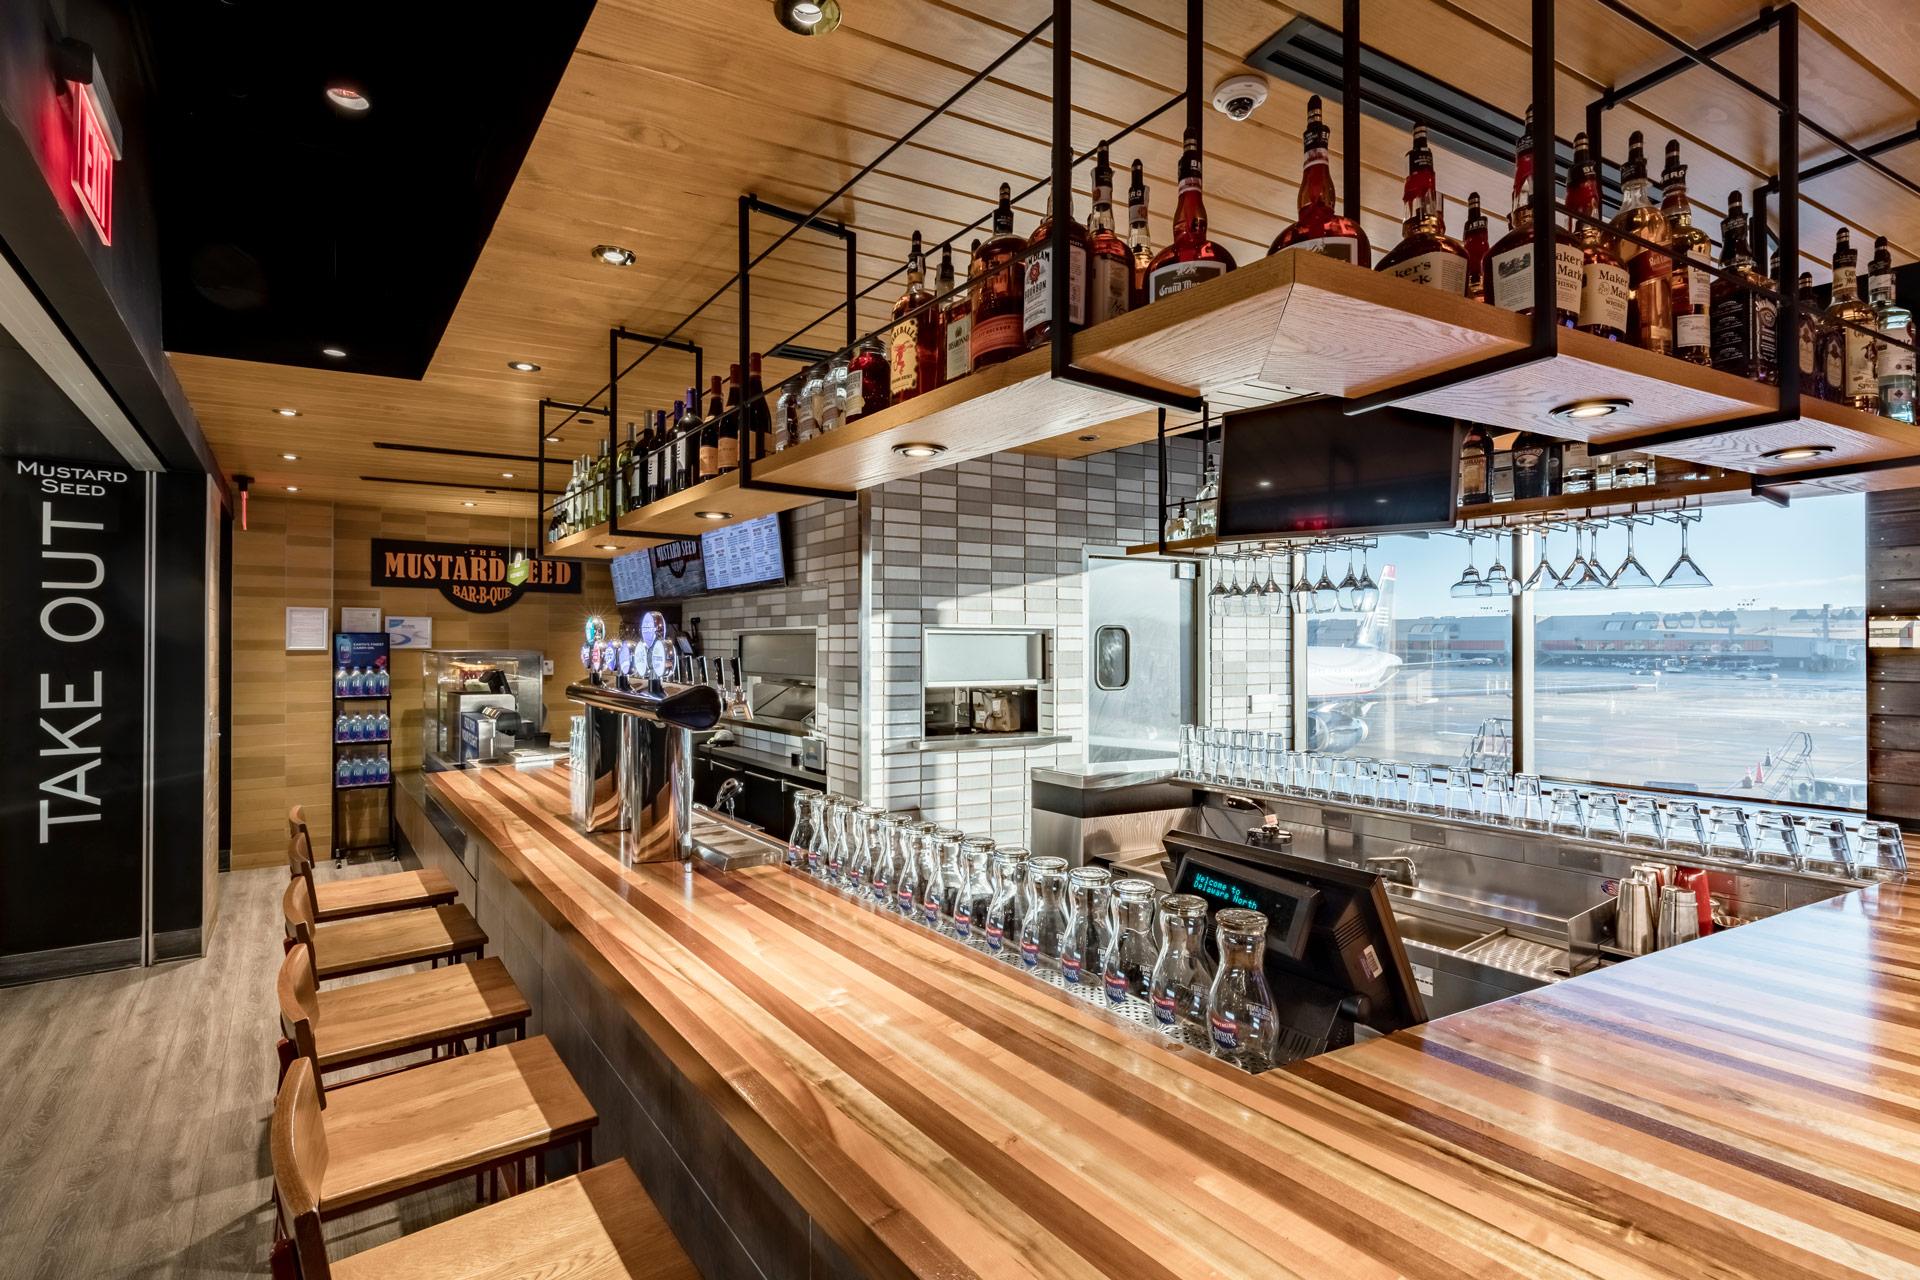 Mustard Seed restaurant design